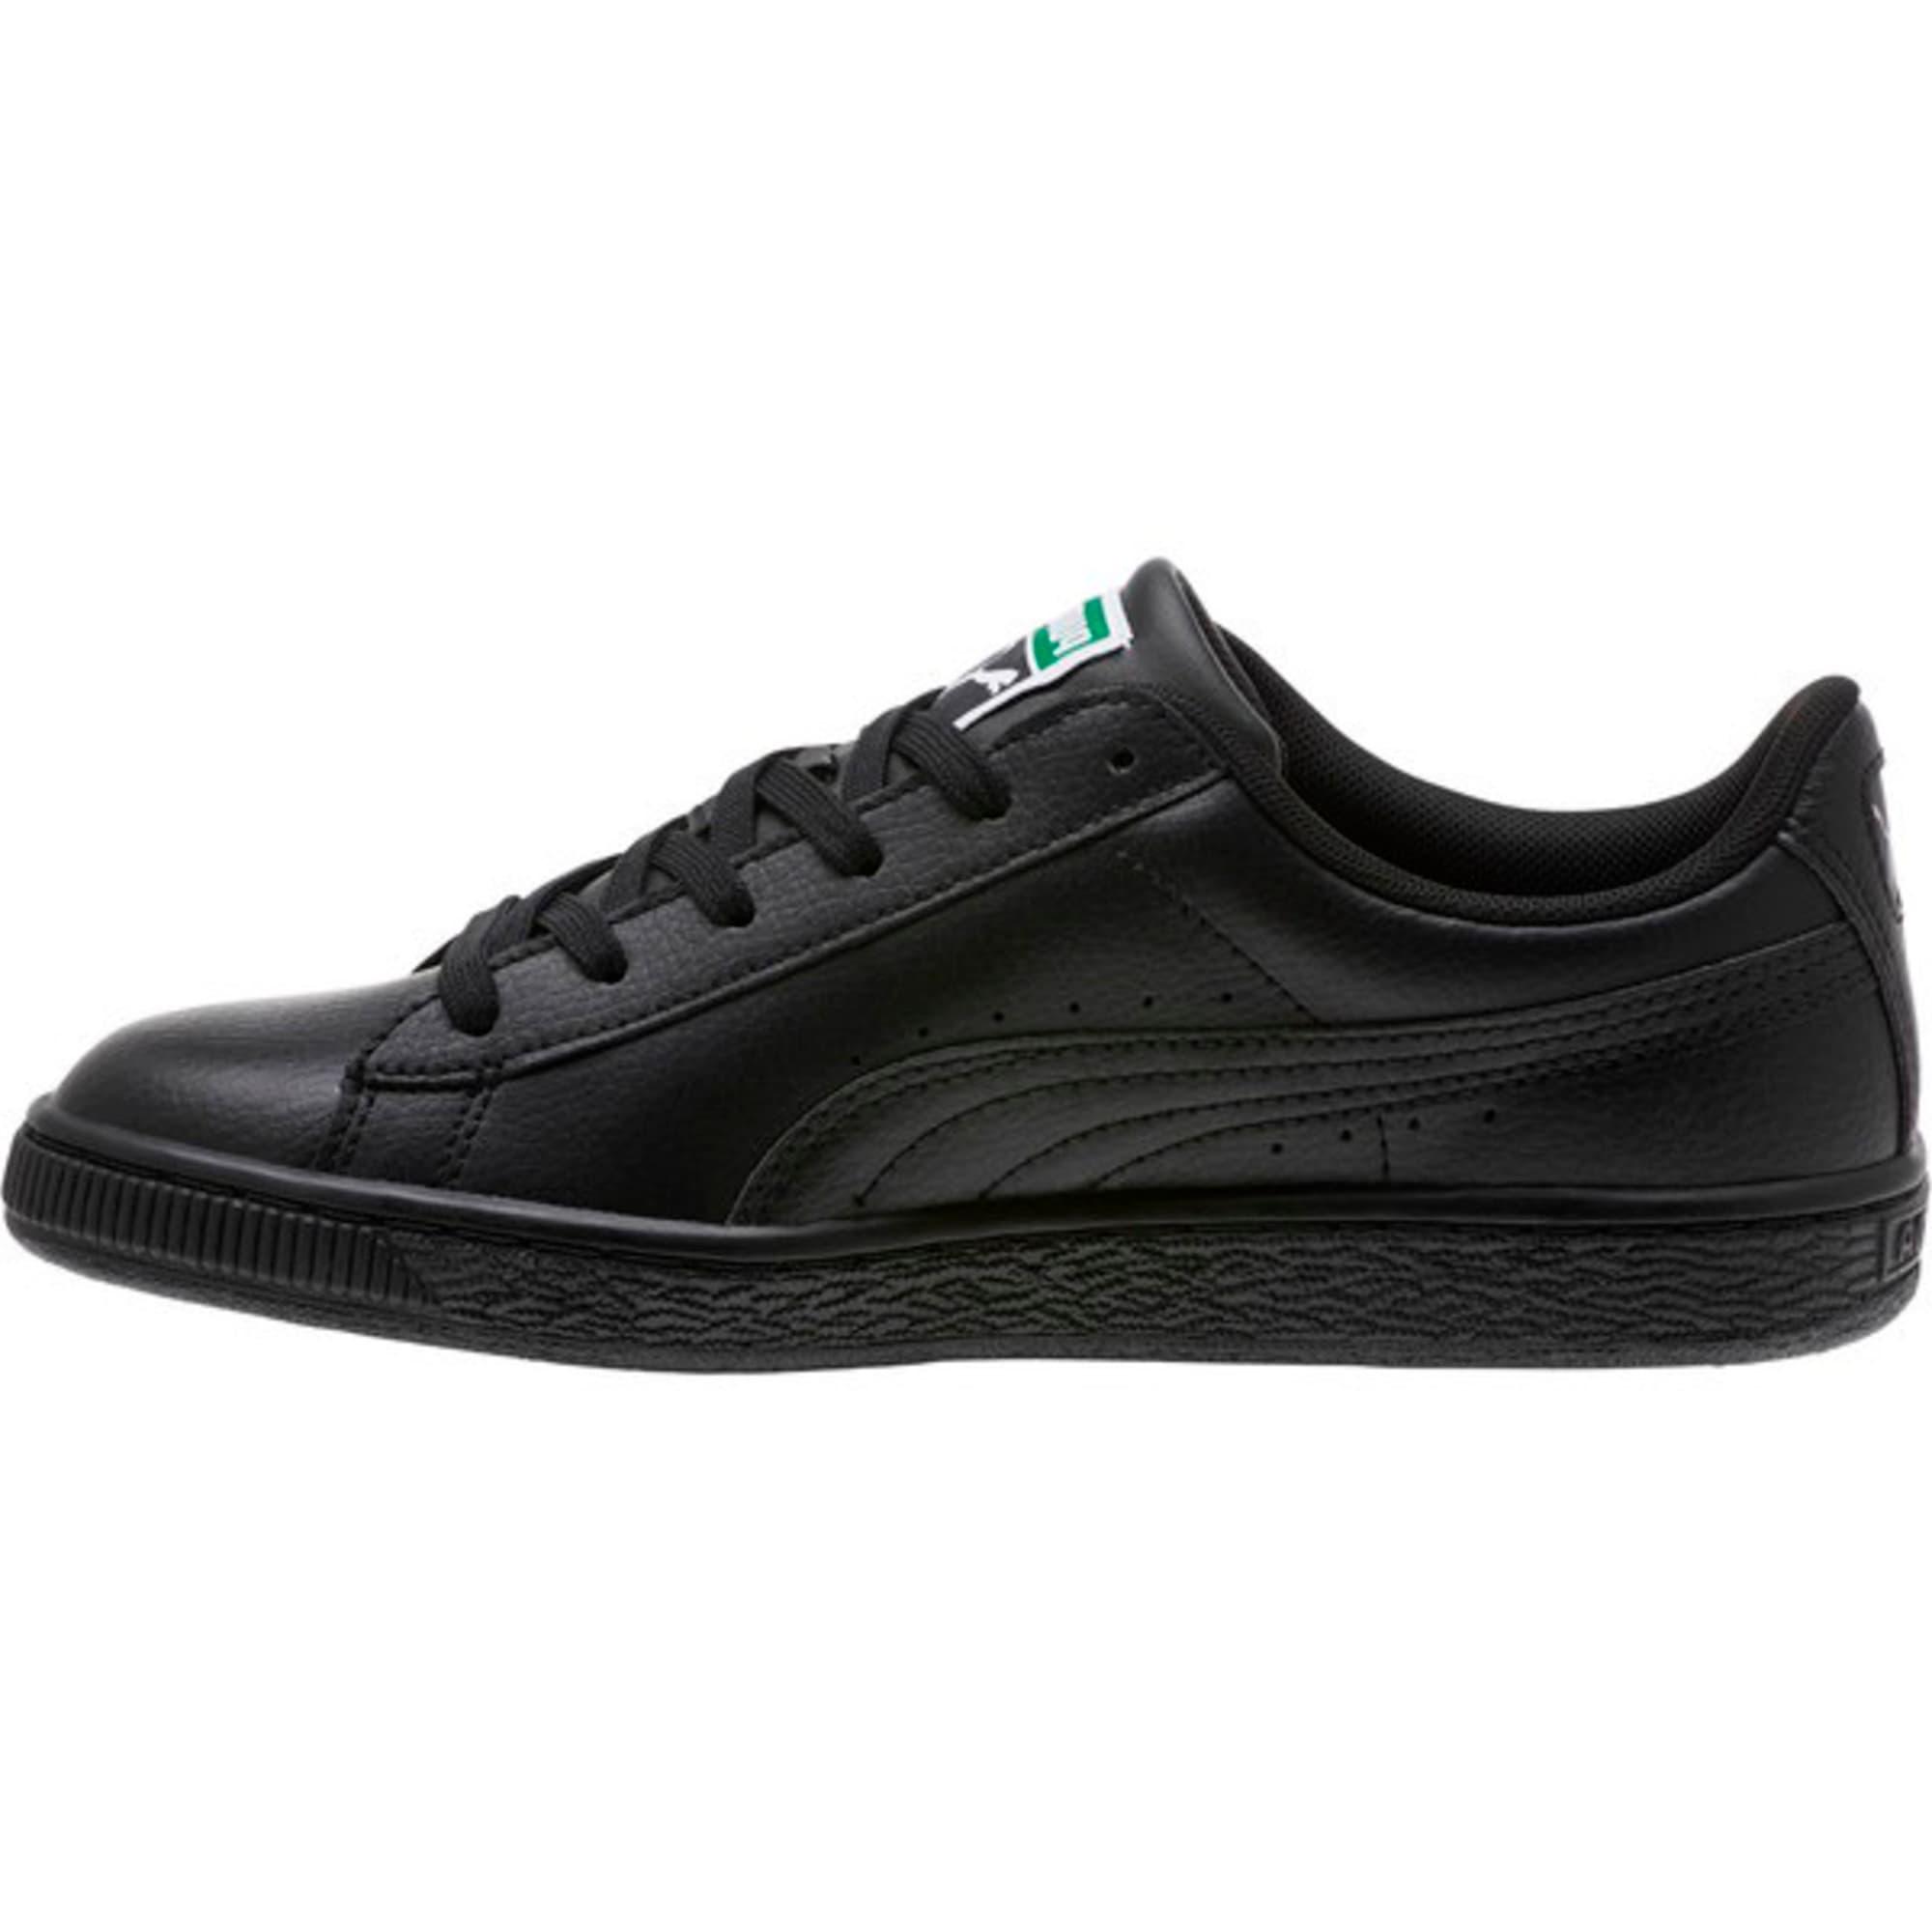 Thumbnail 1 of Basket Classic Sneakers JR, Puma Black-Puma Black, medium